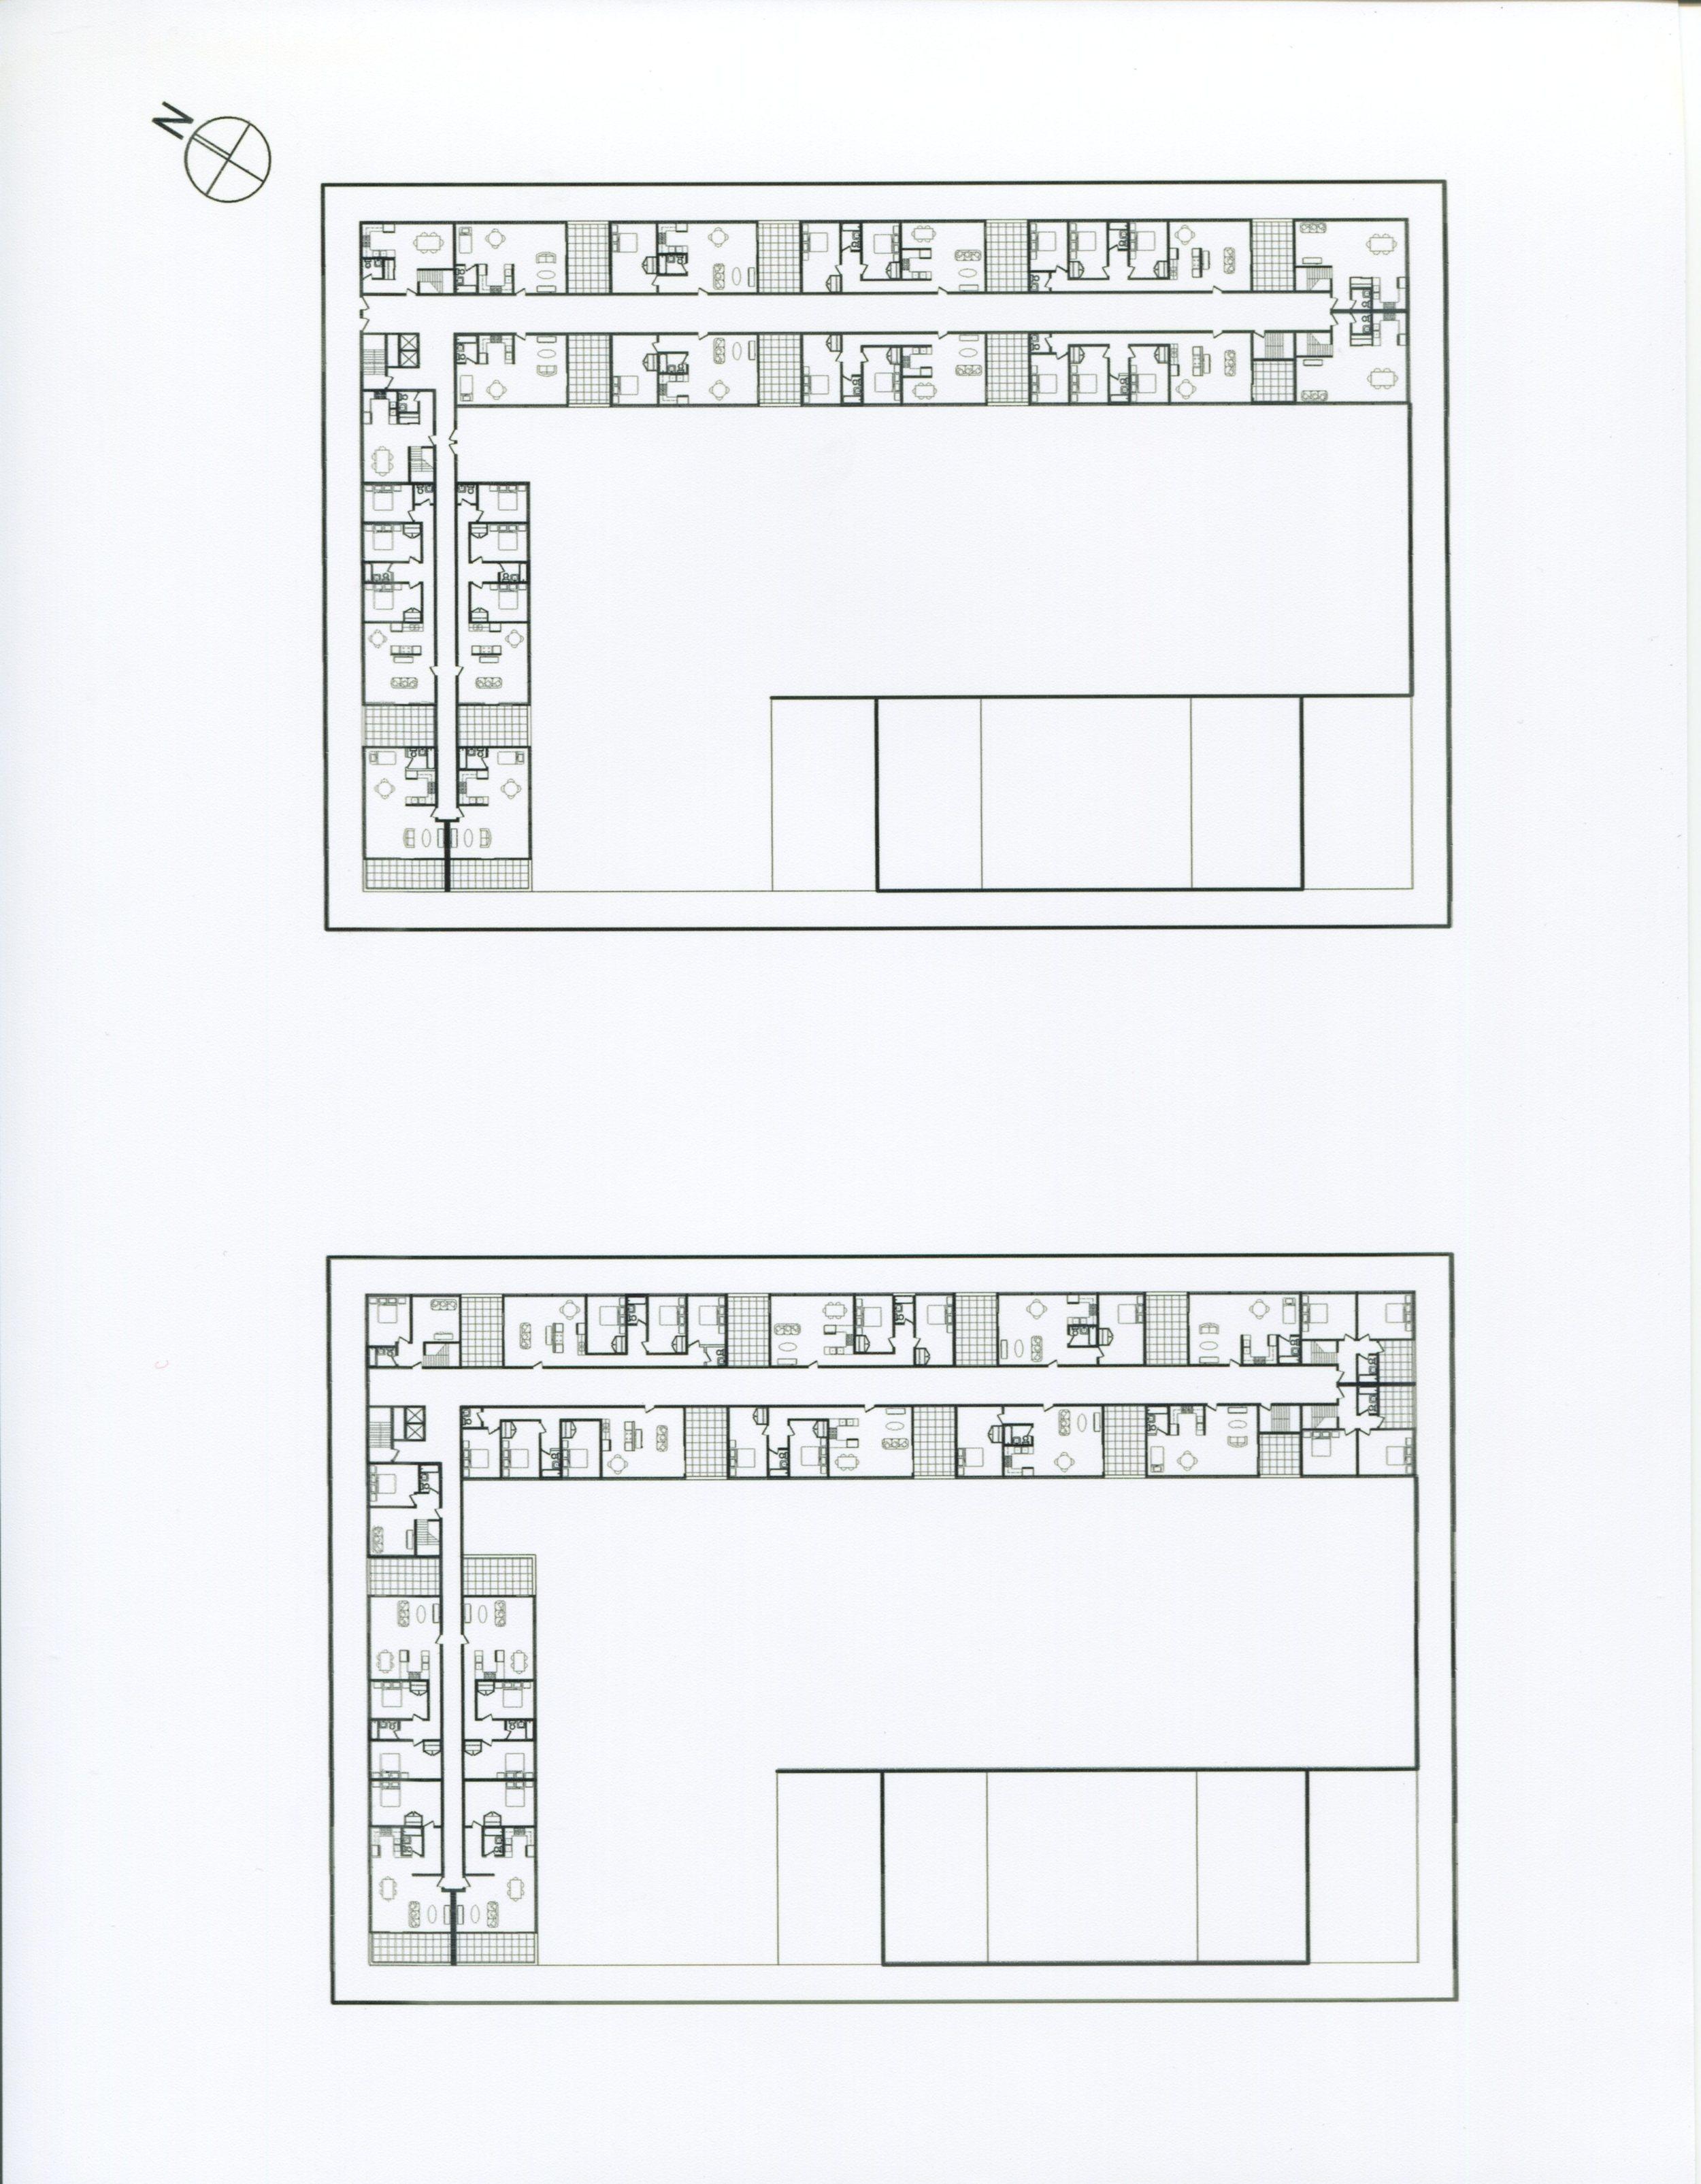 b6bdb6_d1fd388ecbcb861736f6a1a440873297.jpg